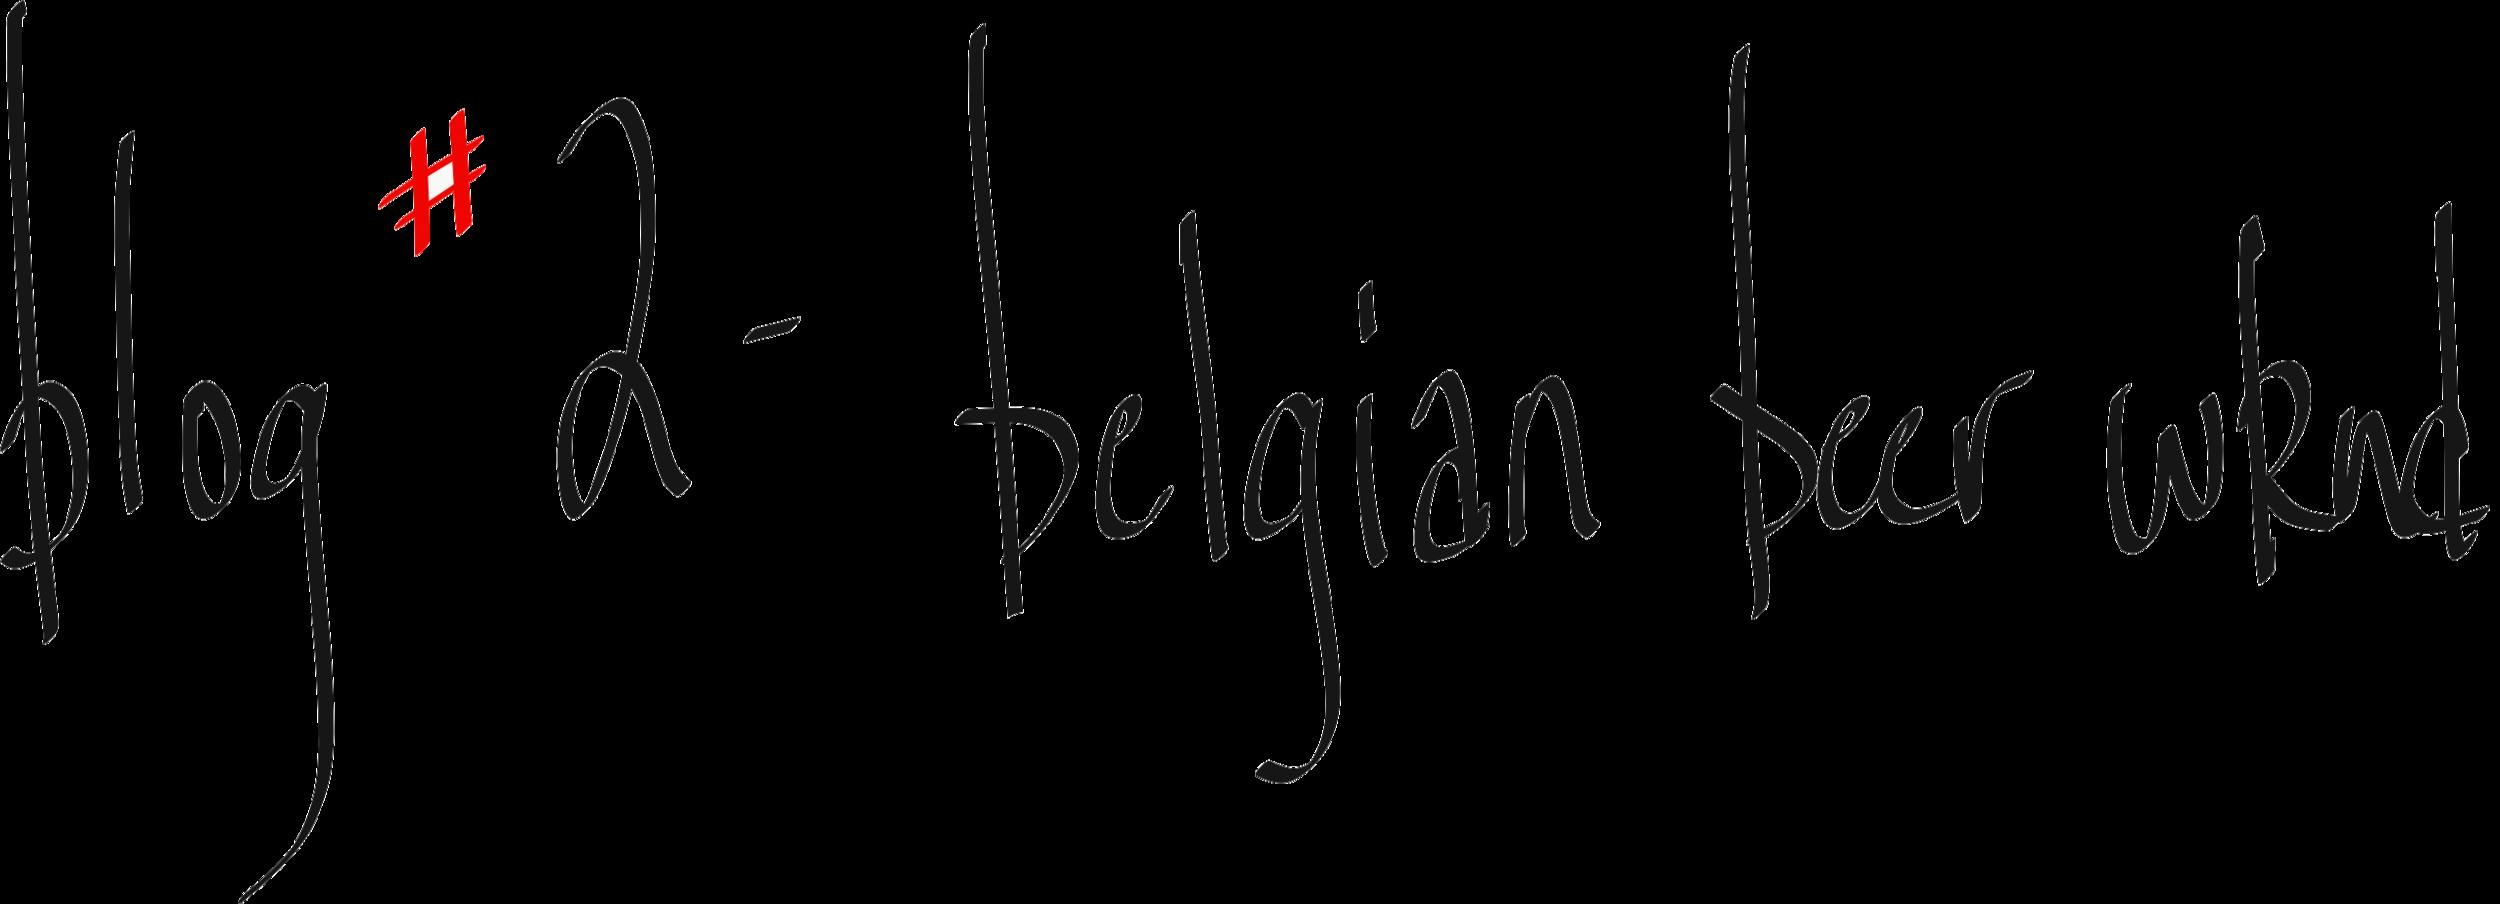 tilte-blog2-belgian-beer-wknd.PNG